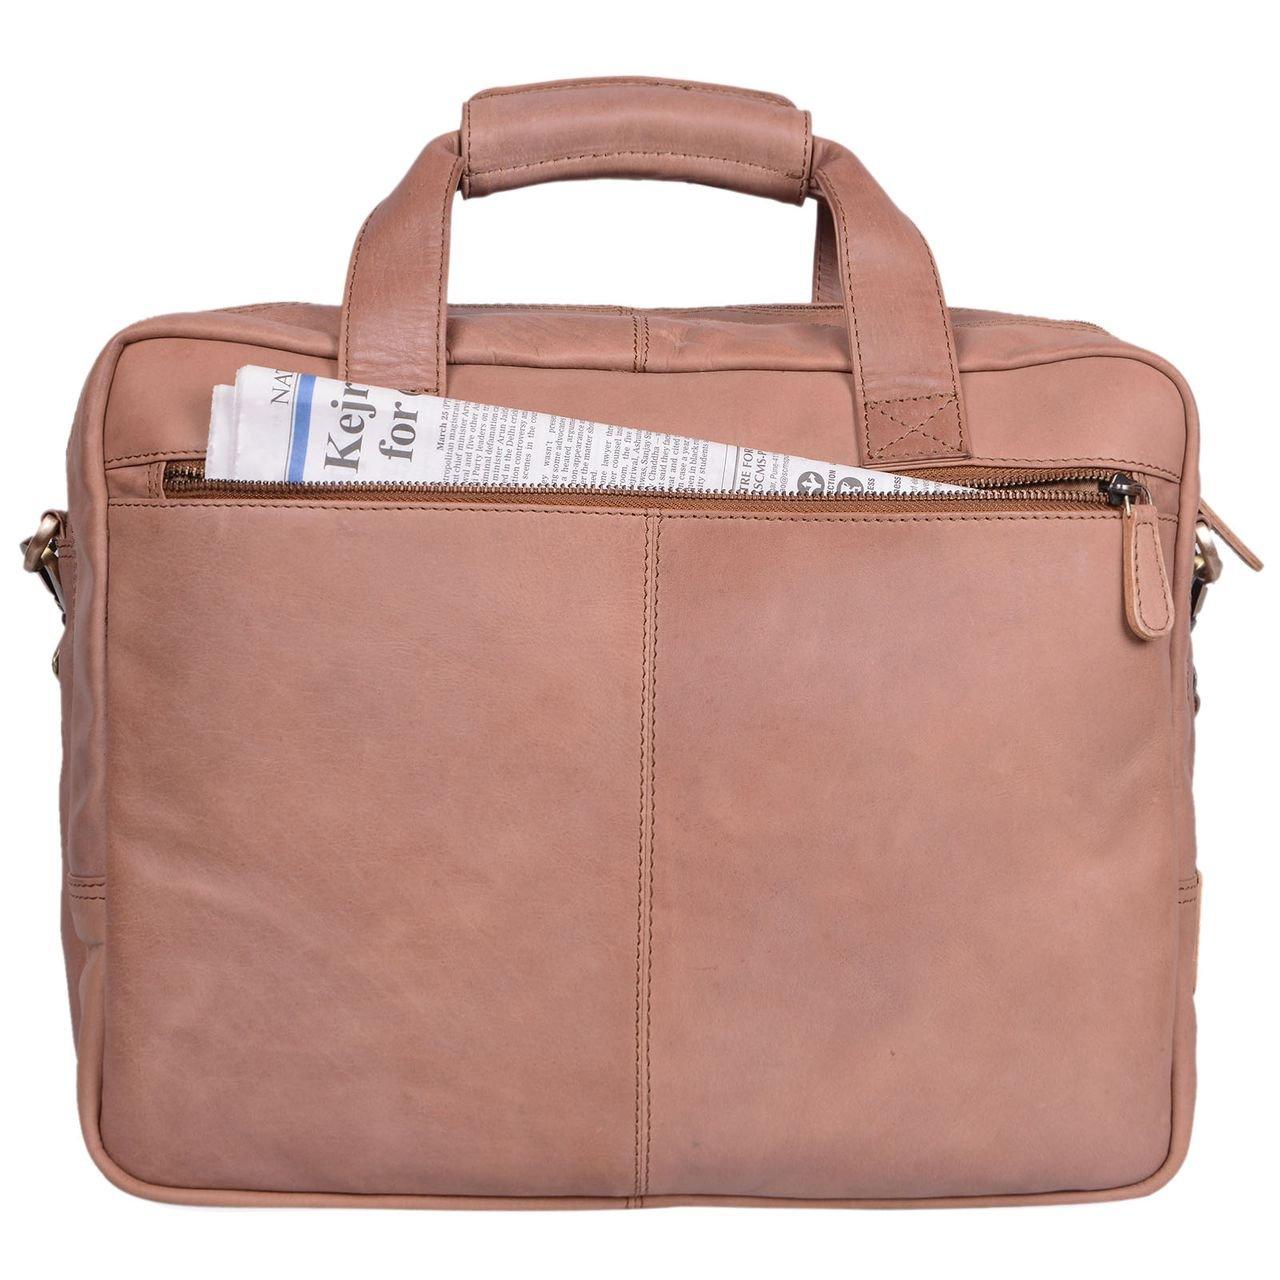 1f5c2048d35f STILORD  Adventure  Vintage Teacher Bag Men Women Business Leather Satchel  Shoulder Laptop Large Working Office Leather